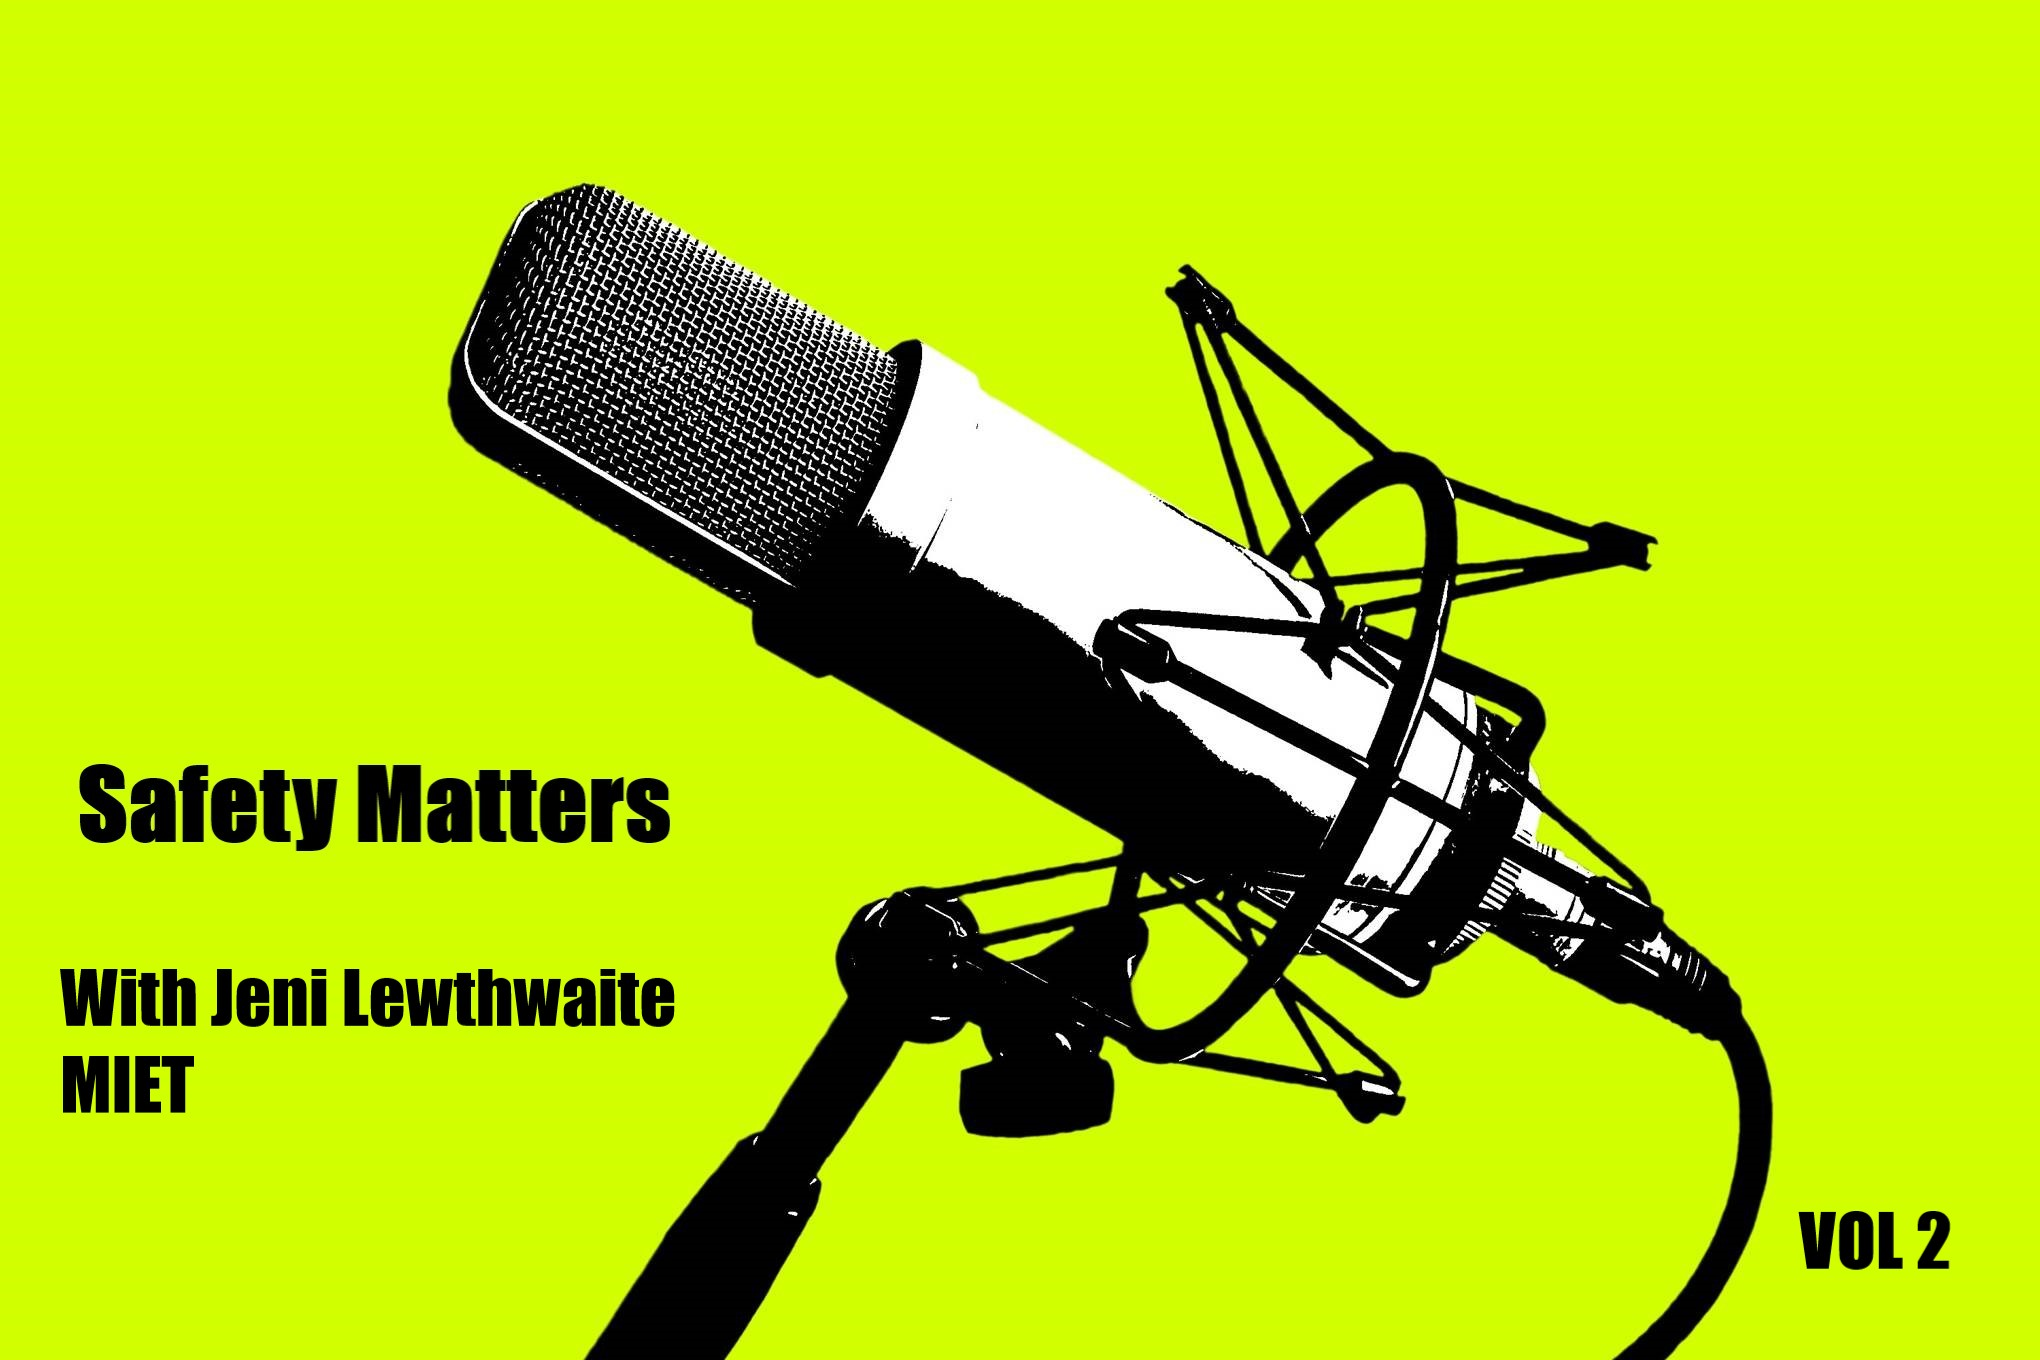 Jeni Lewthwaite talks to Alan Carole as part of his Safety Matters Series